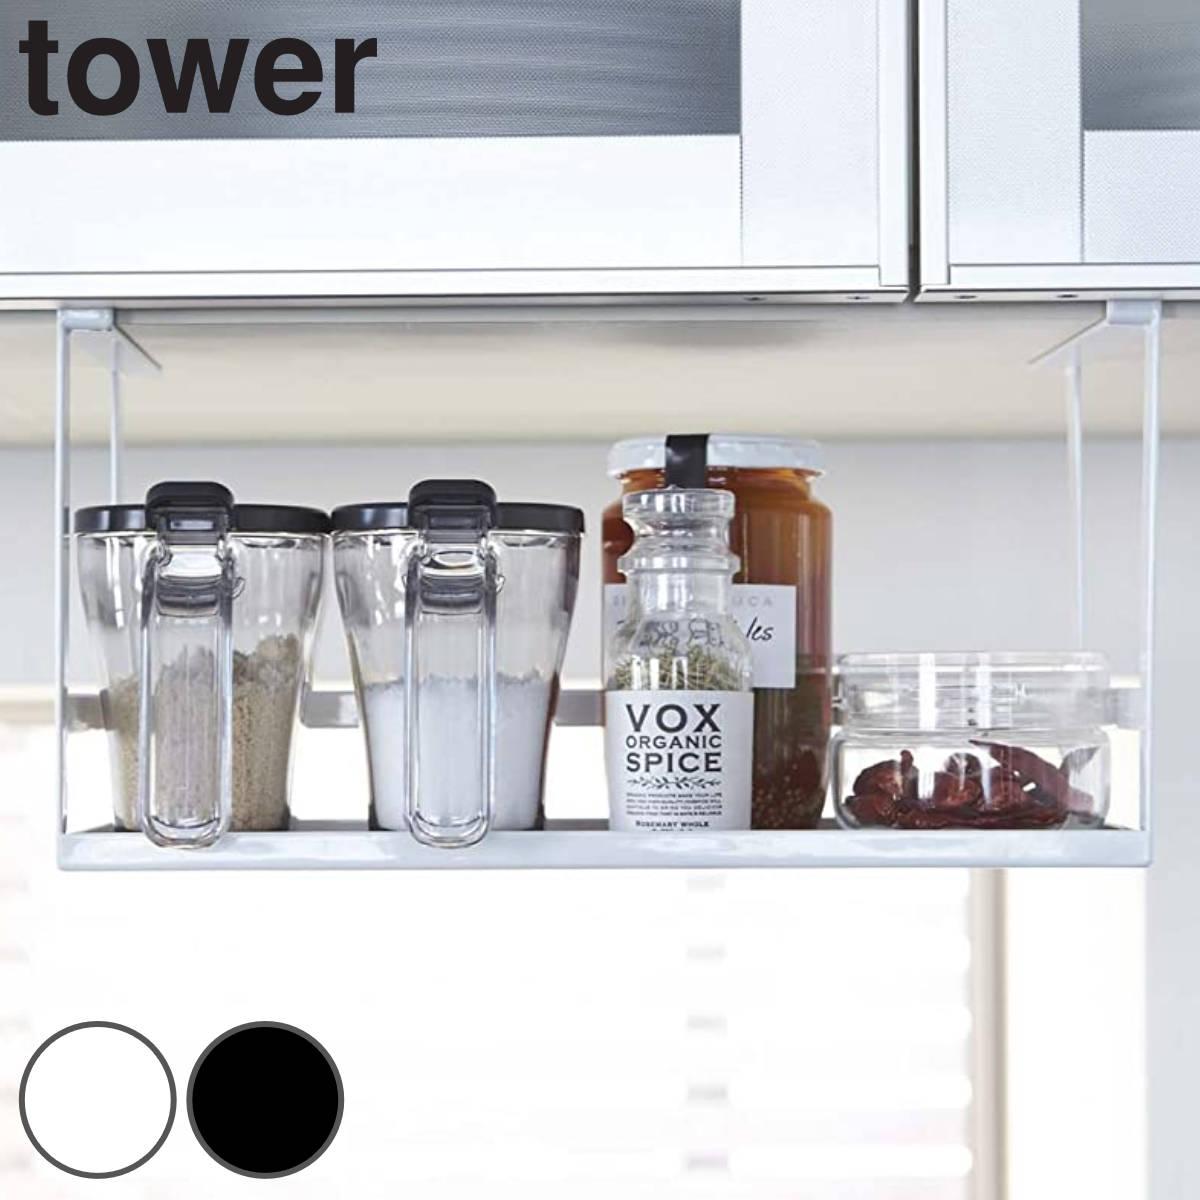 Hanging Rack Closet Under The Condiment Rack Tower Tower (kitchen Storage  Condiments Shelf Accessory Storage